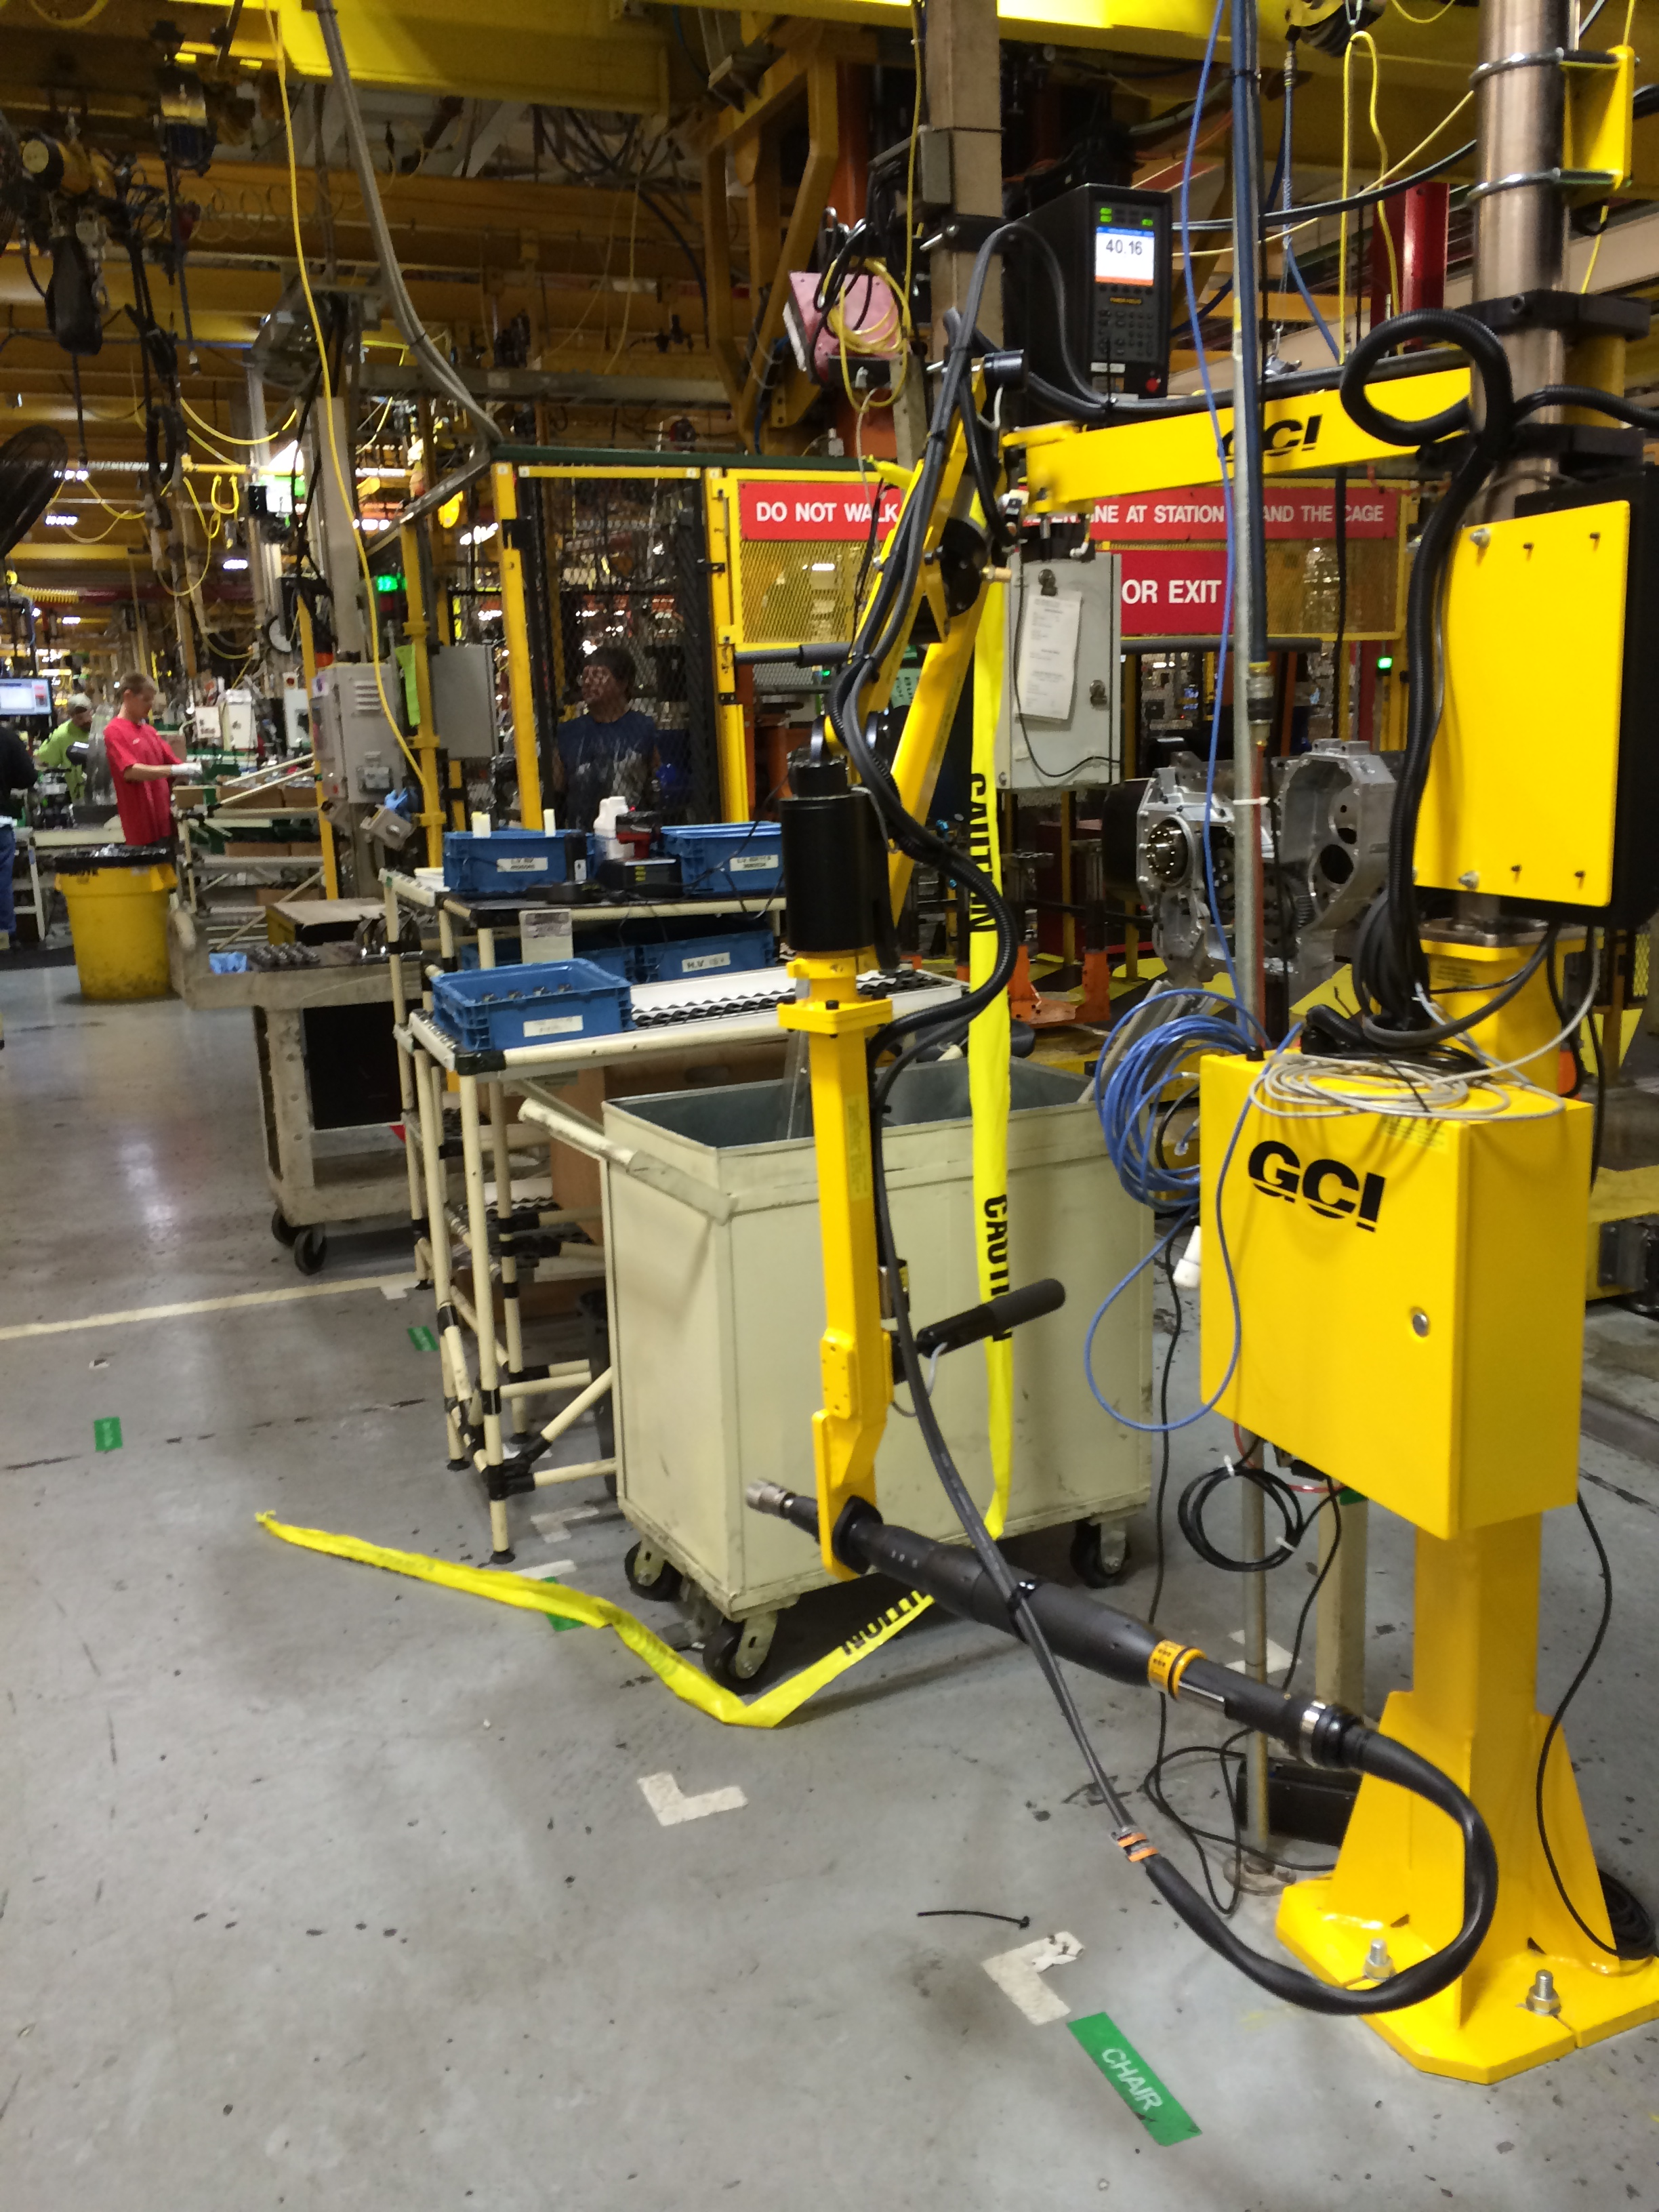 Gci Torque Arm : Torque reacting articulating arms ohio tool systems